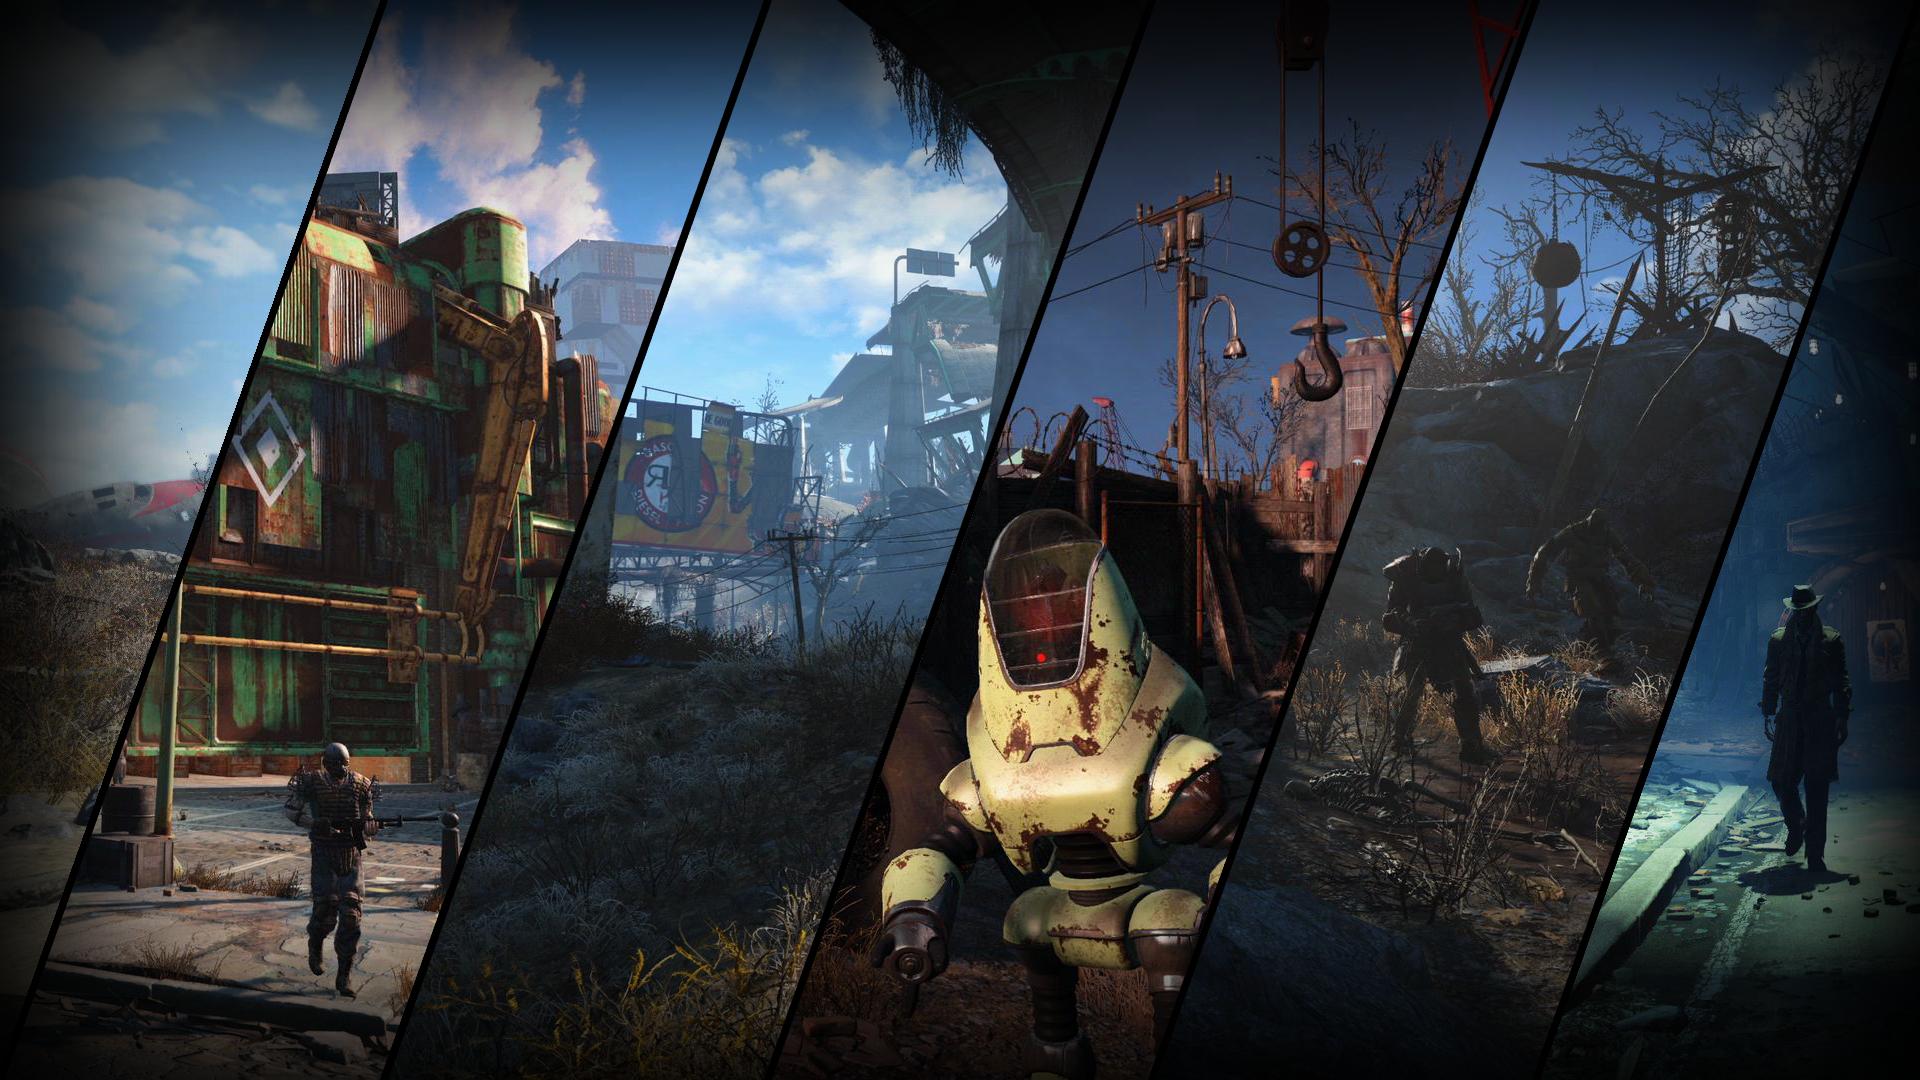 Fallout 4 Brotherhood Of Steel Clipart 0a5d3b617dae89a50b4c0ef6dcb083